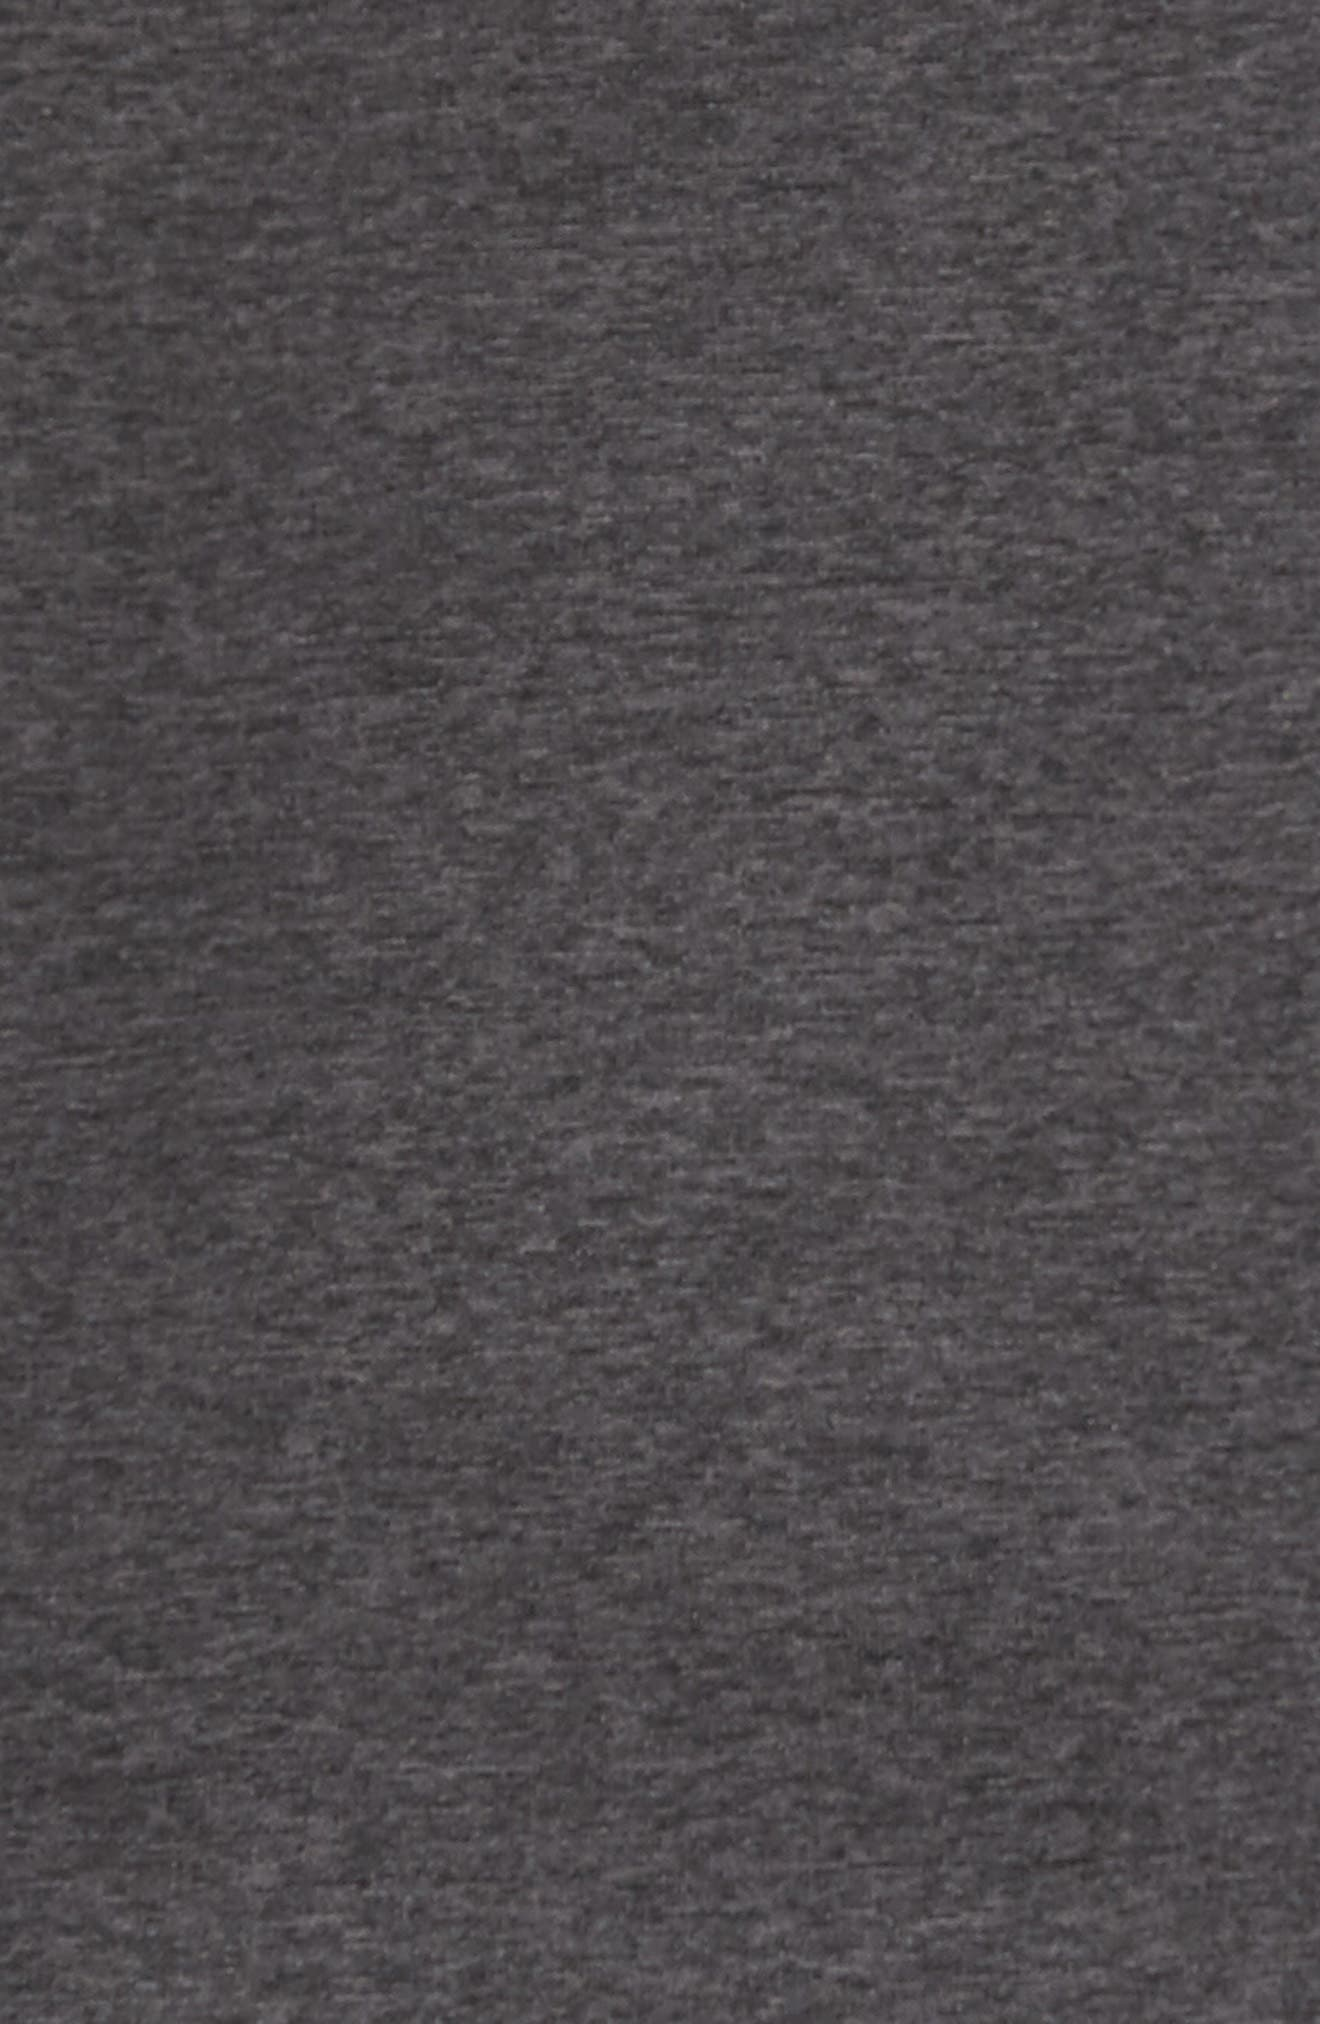 Shep Performance Fleece Quarter Zip Pullover,                             Alternate thumbnail 5, color,                             Charcoal Heather